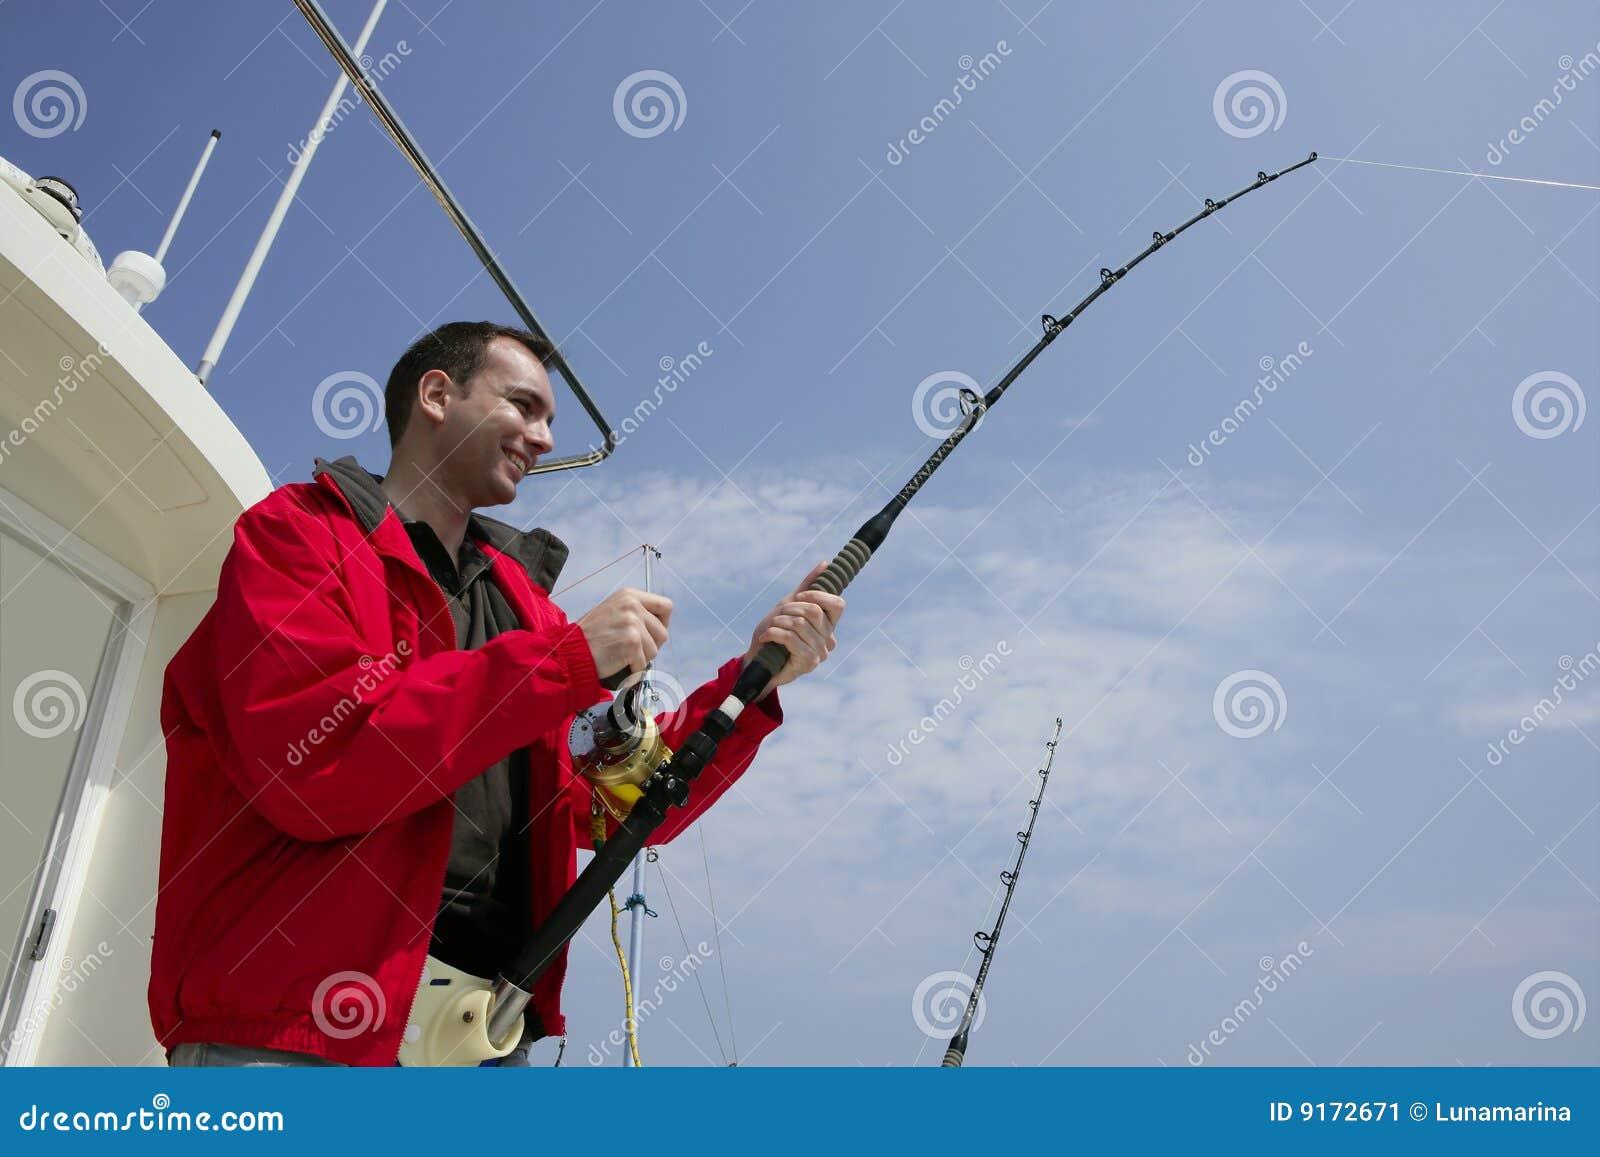 Fisherman fishing on boat big game tuna stock image for Tuna fishing games